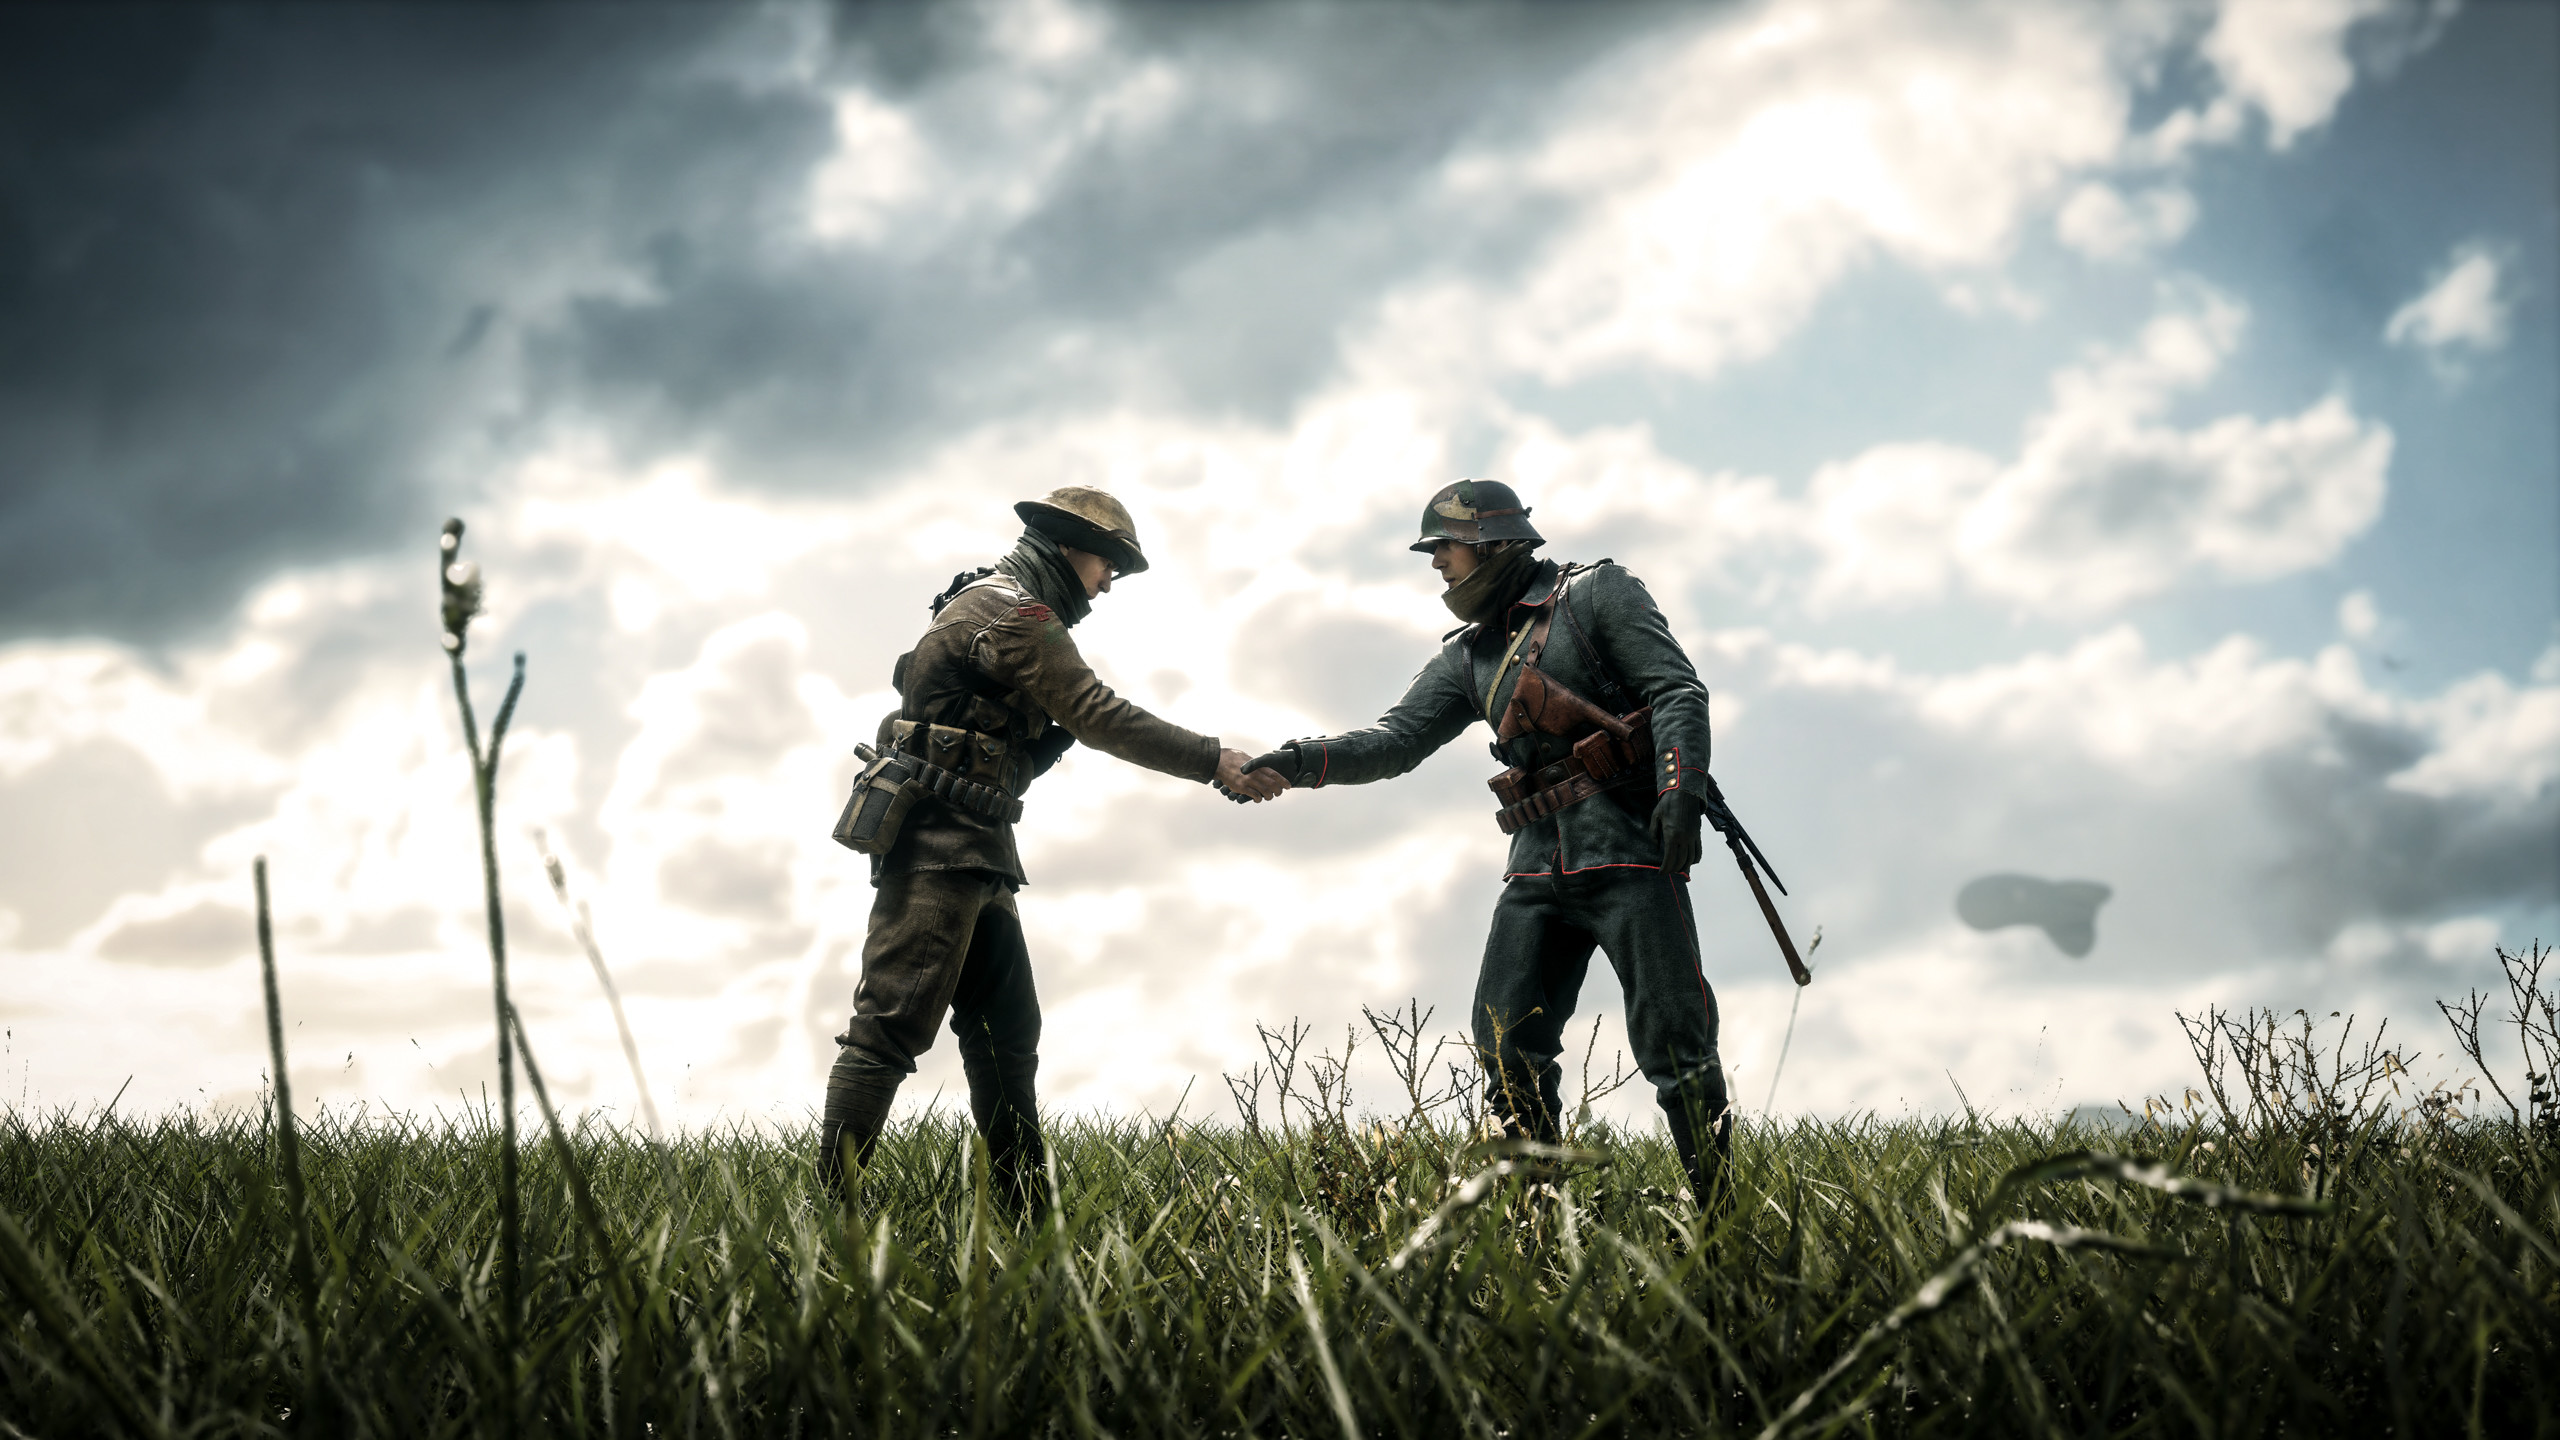 Battlefield 1 Wallpaper (72+ Images